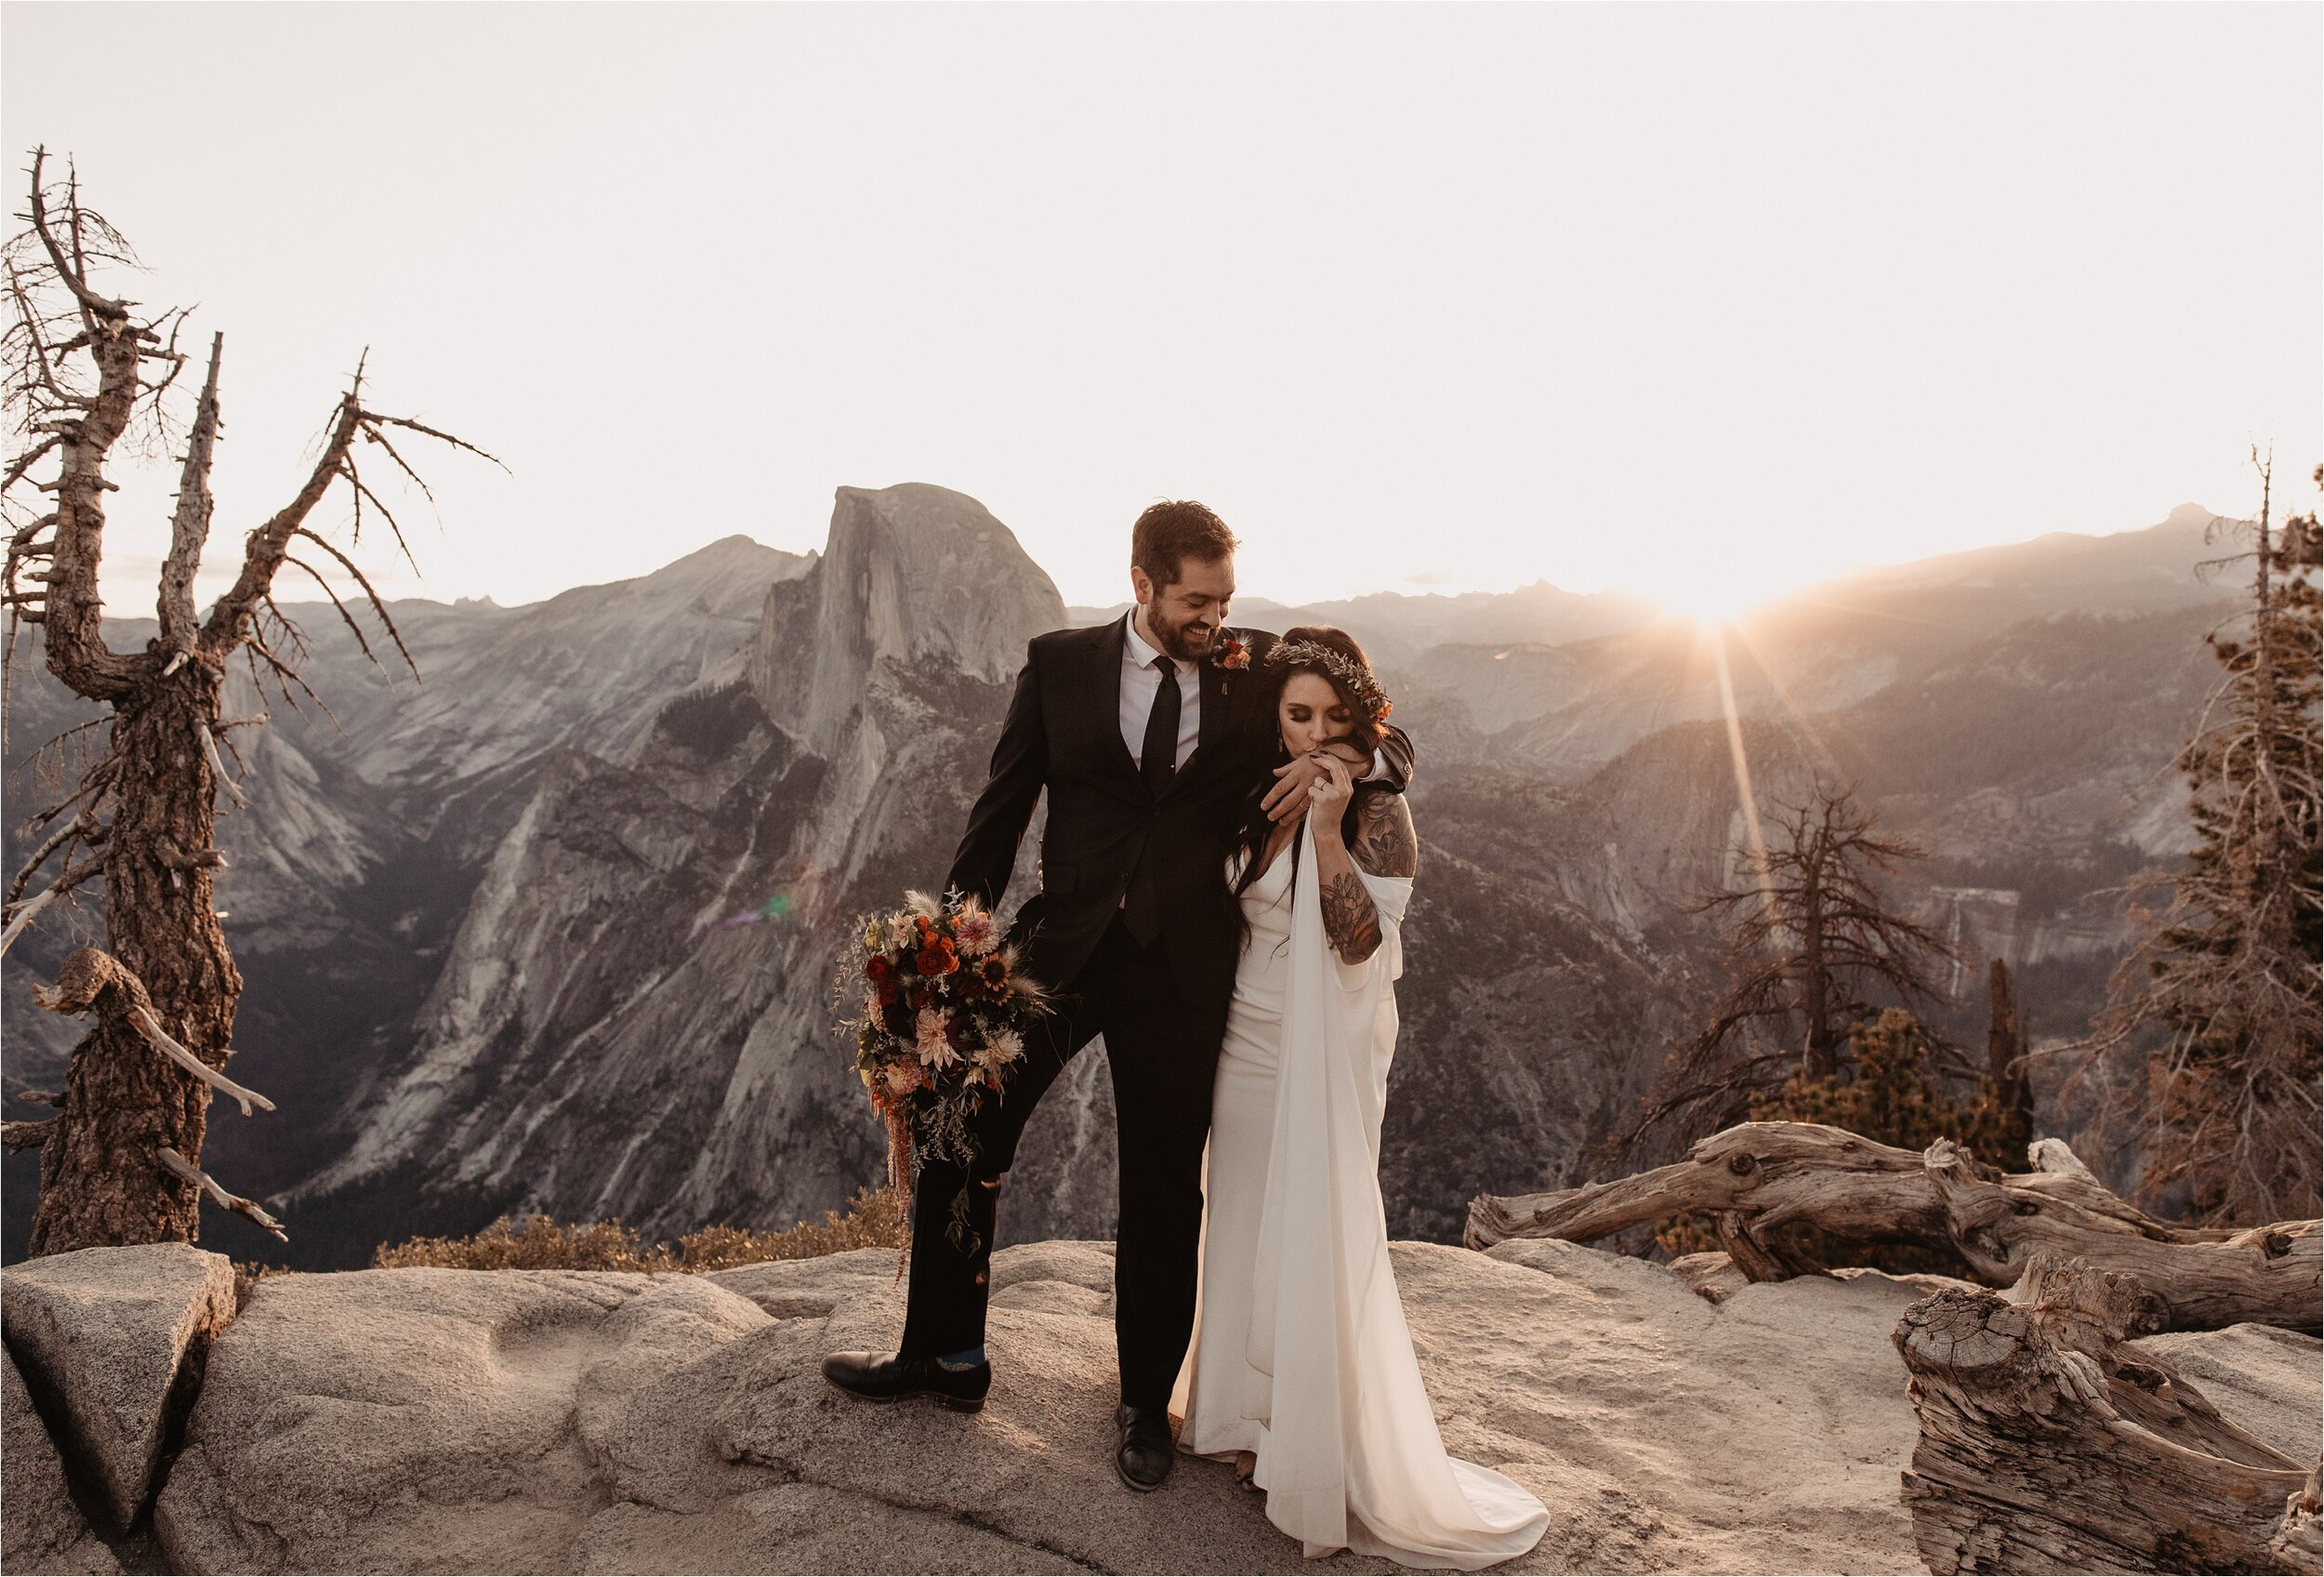 glacier-point-yosemite-elopement-ceremony_0022.jpg